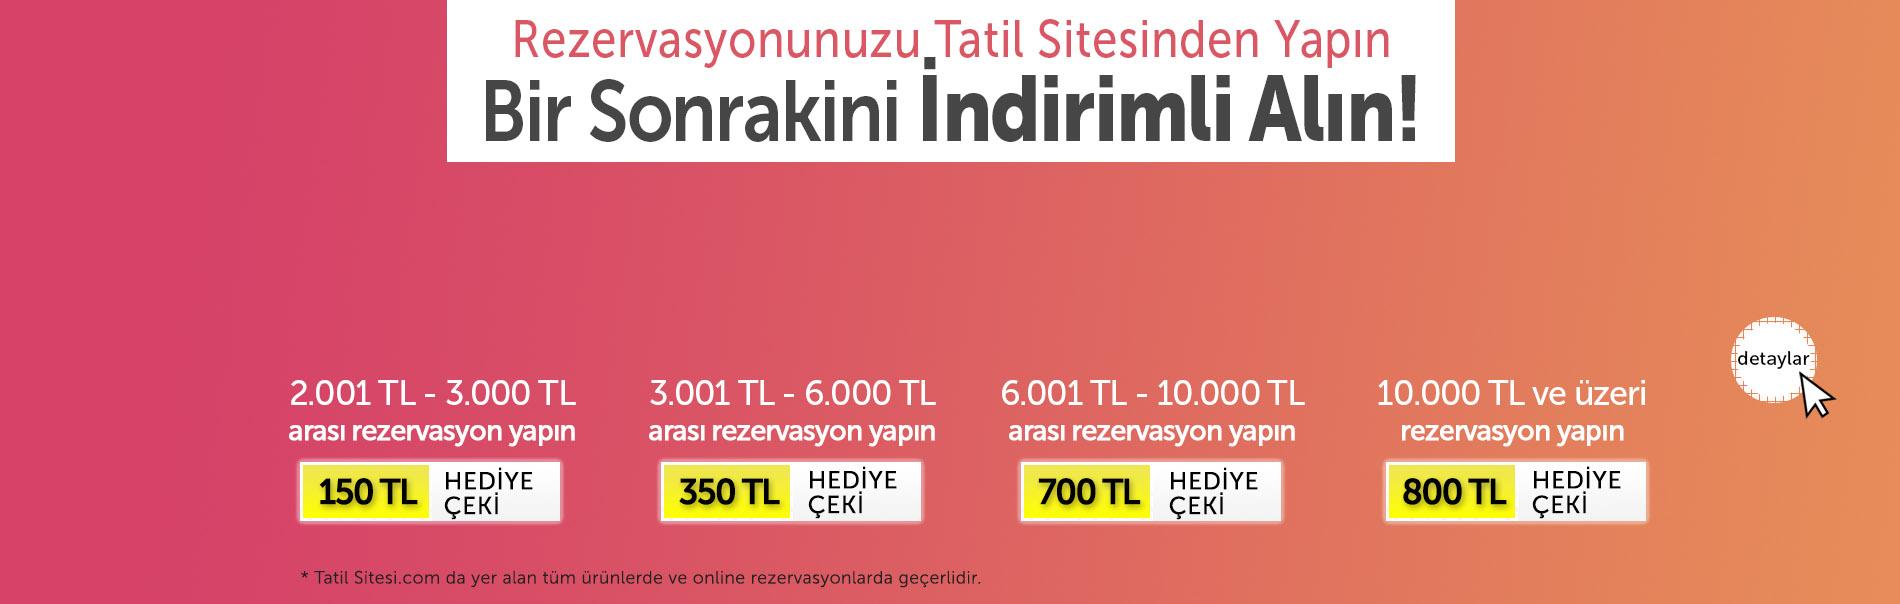 tatiltesicom-indirim-0307201911394